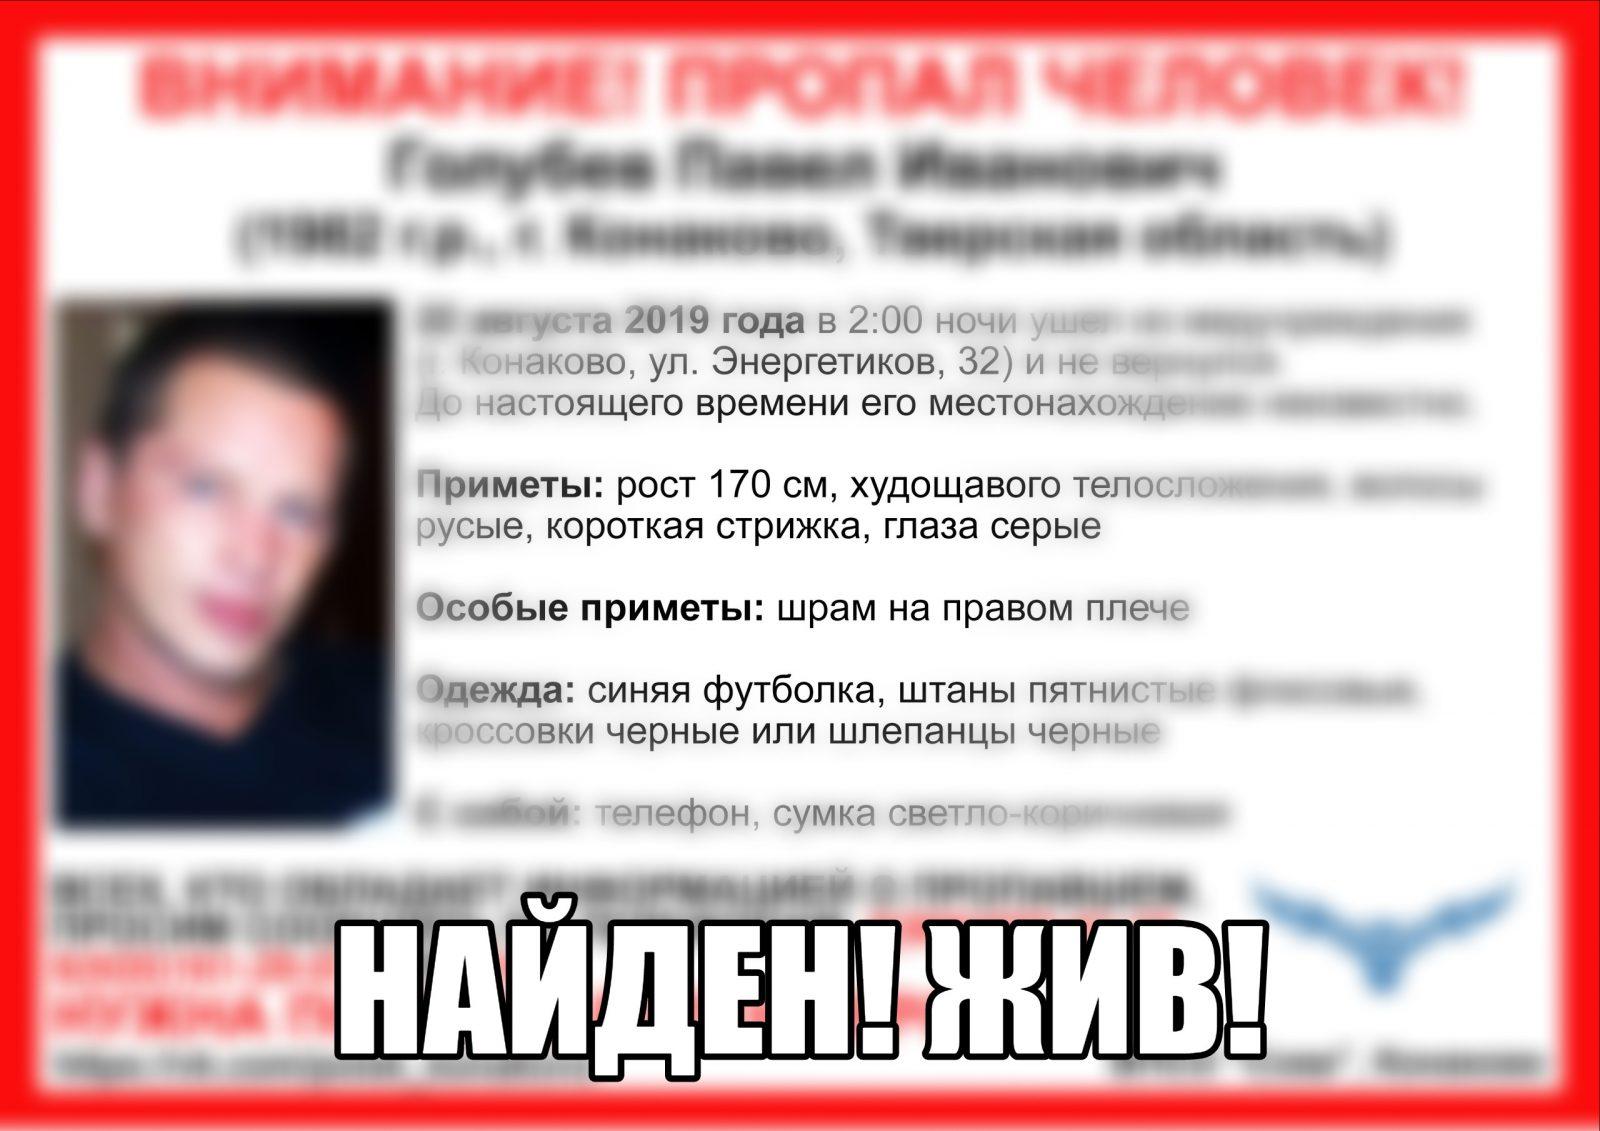 [Жив] Пропал Голубев Павел Иванович (1982 г.р.)